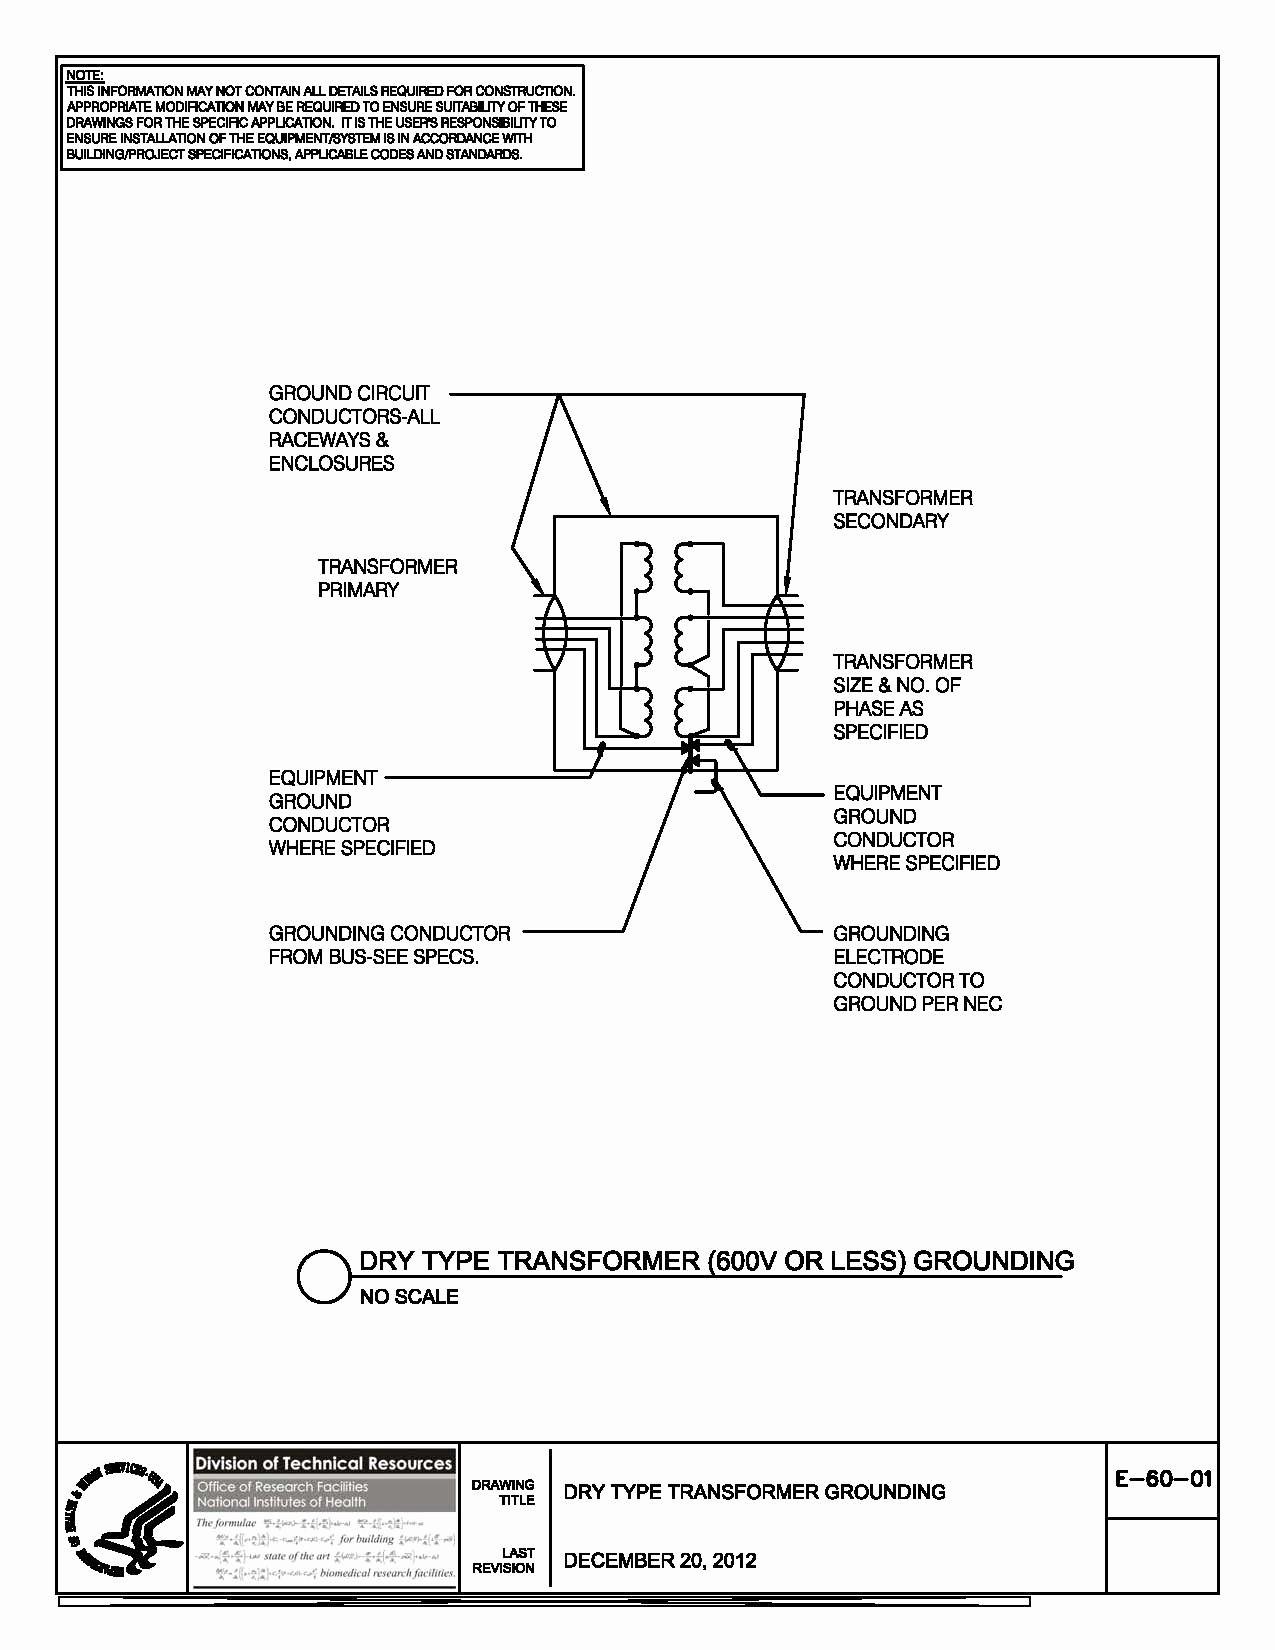 480 to 240 volt transformer wiring diagram 1999 ford f150 headlight 208v 480v dry type transformers